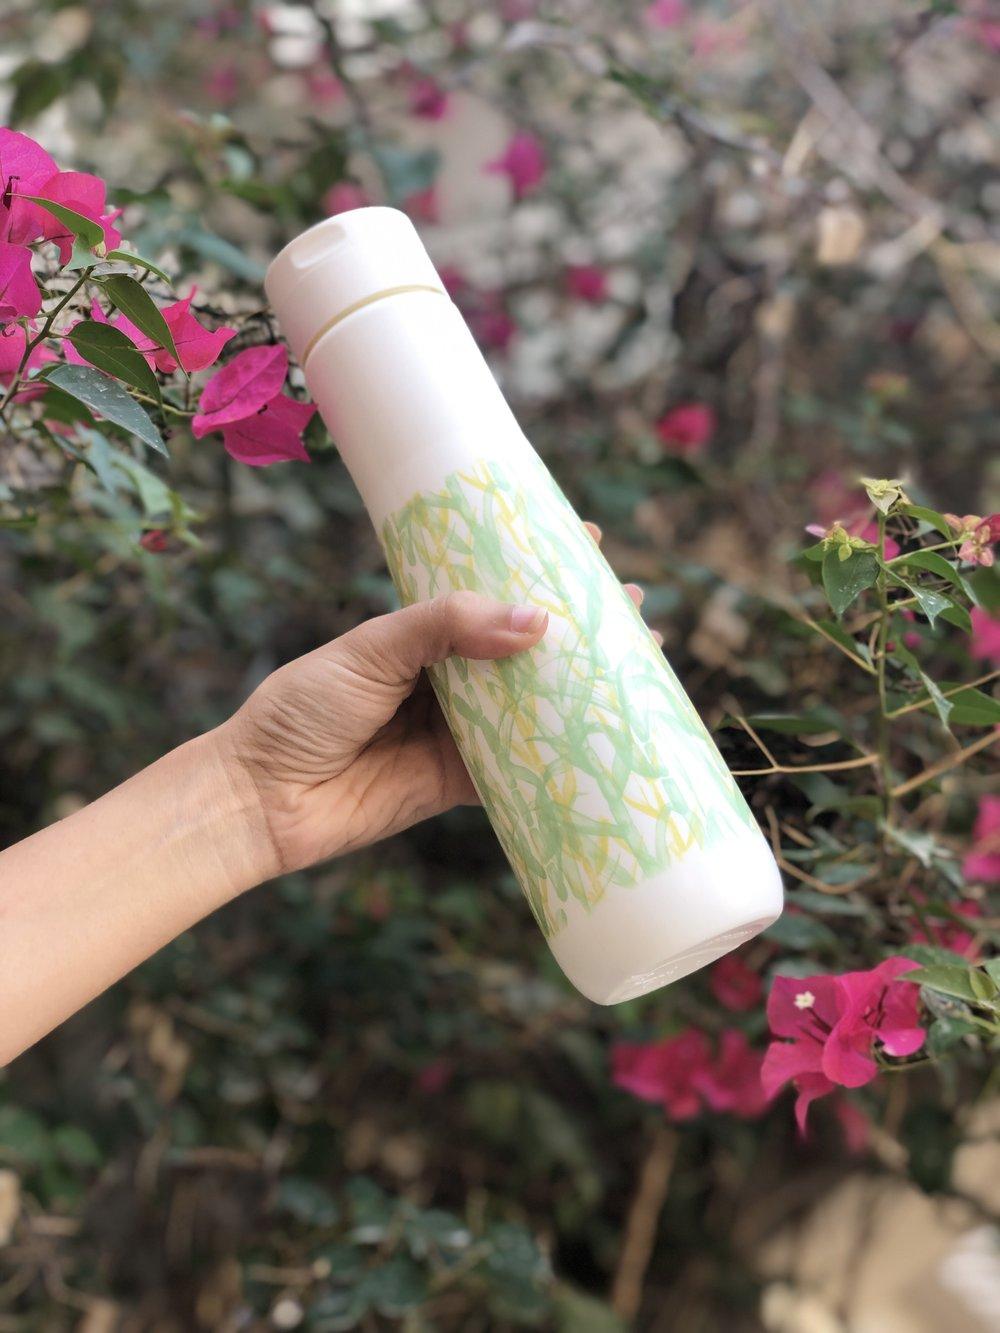 The Namaste reusable water bottle